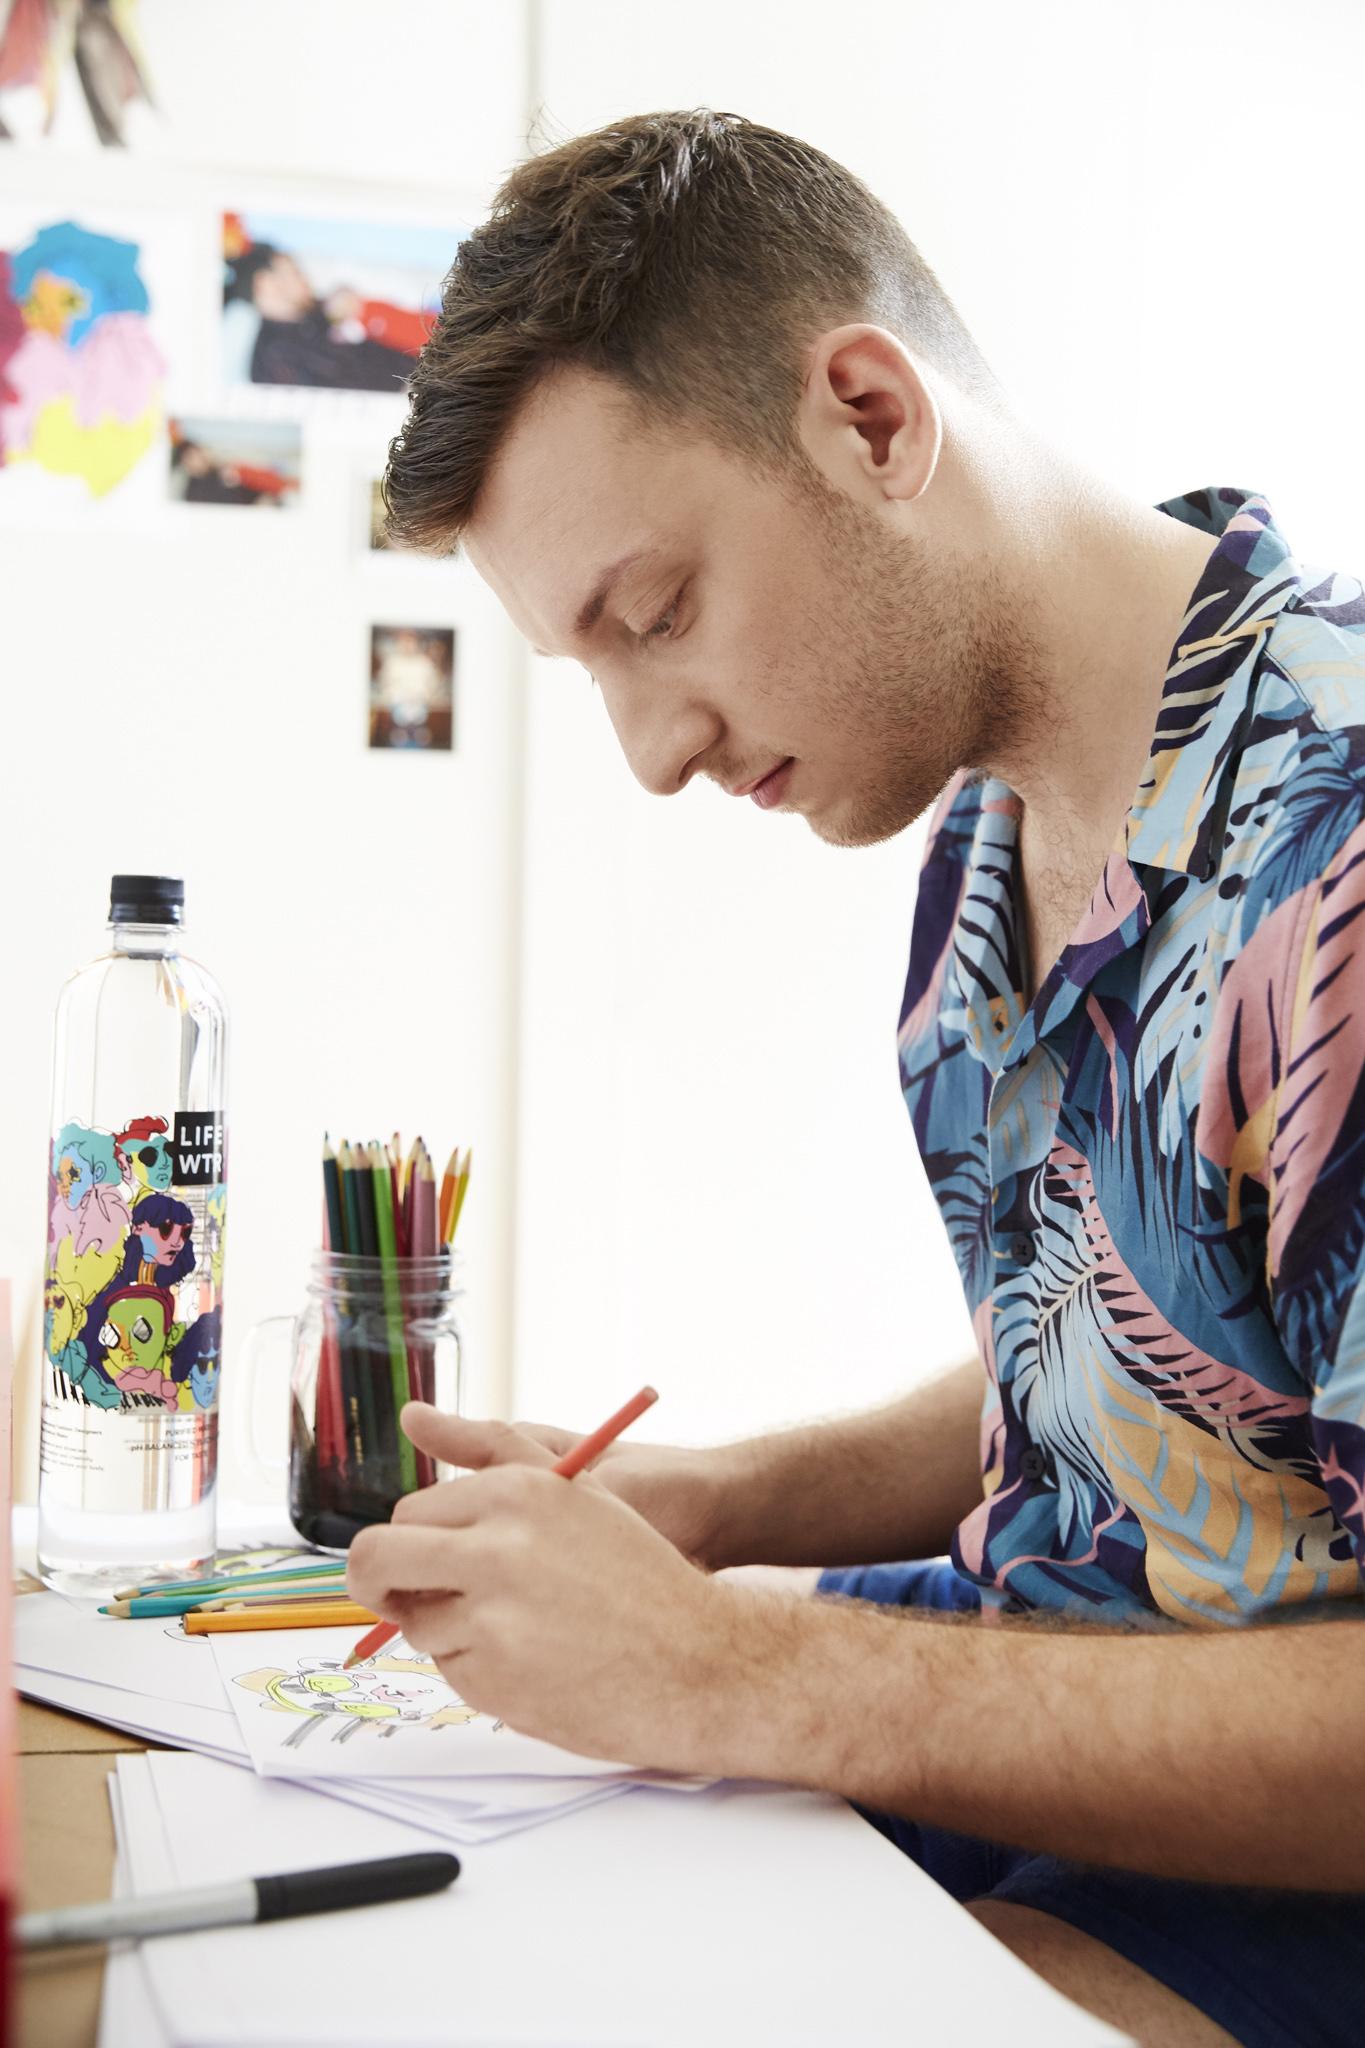 LIFEWTR Series 3 Artist Adam Dalton Blake